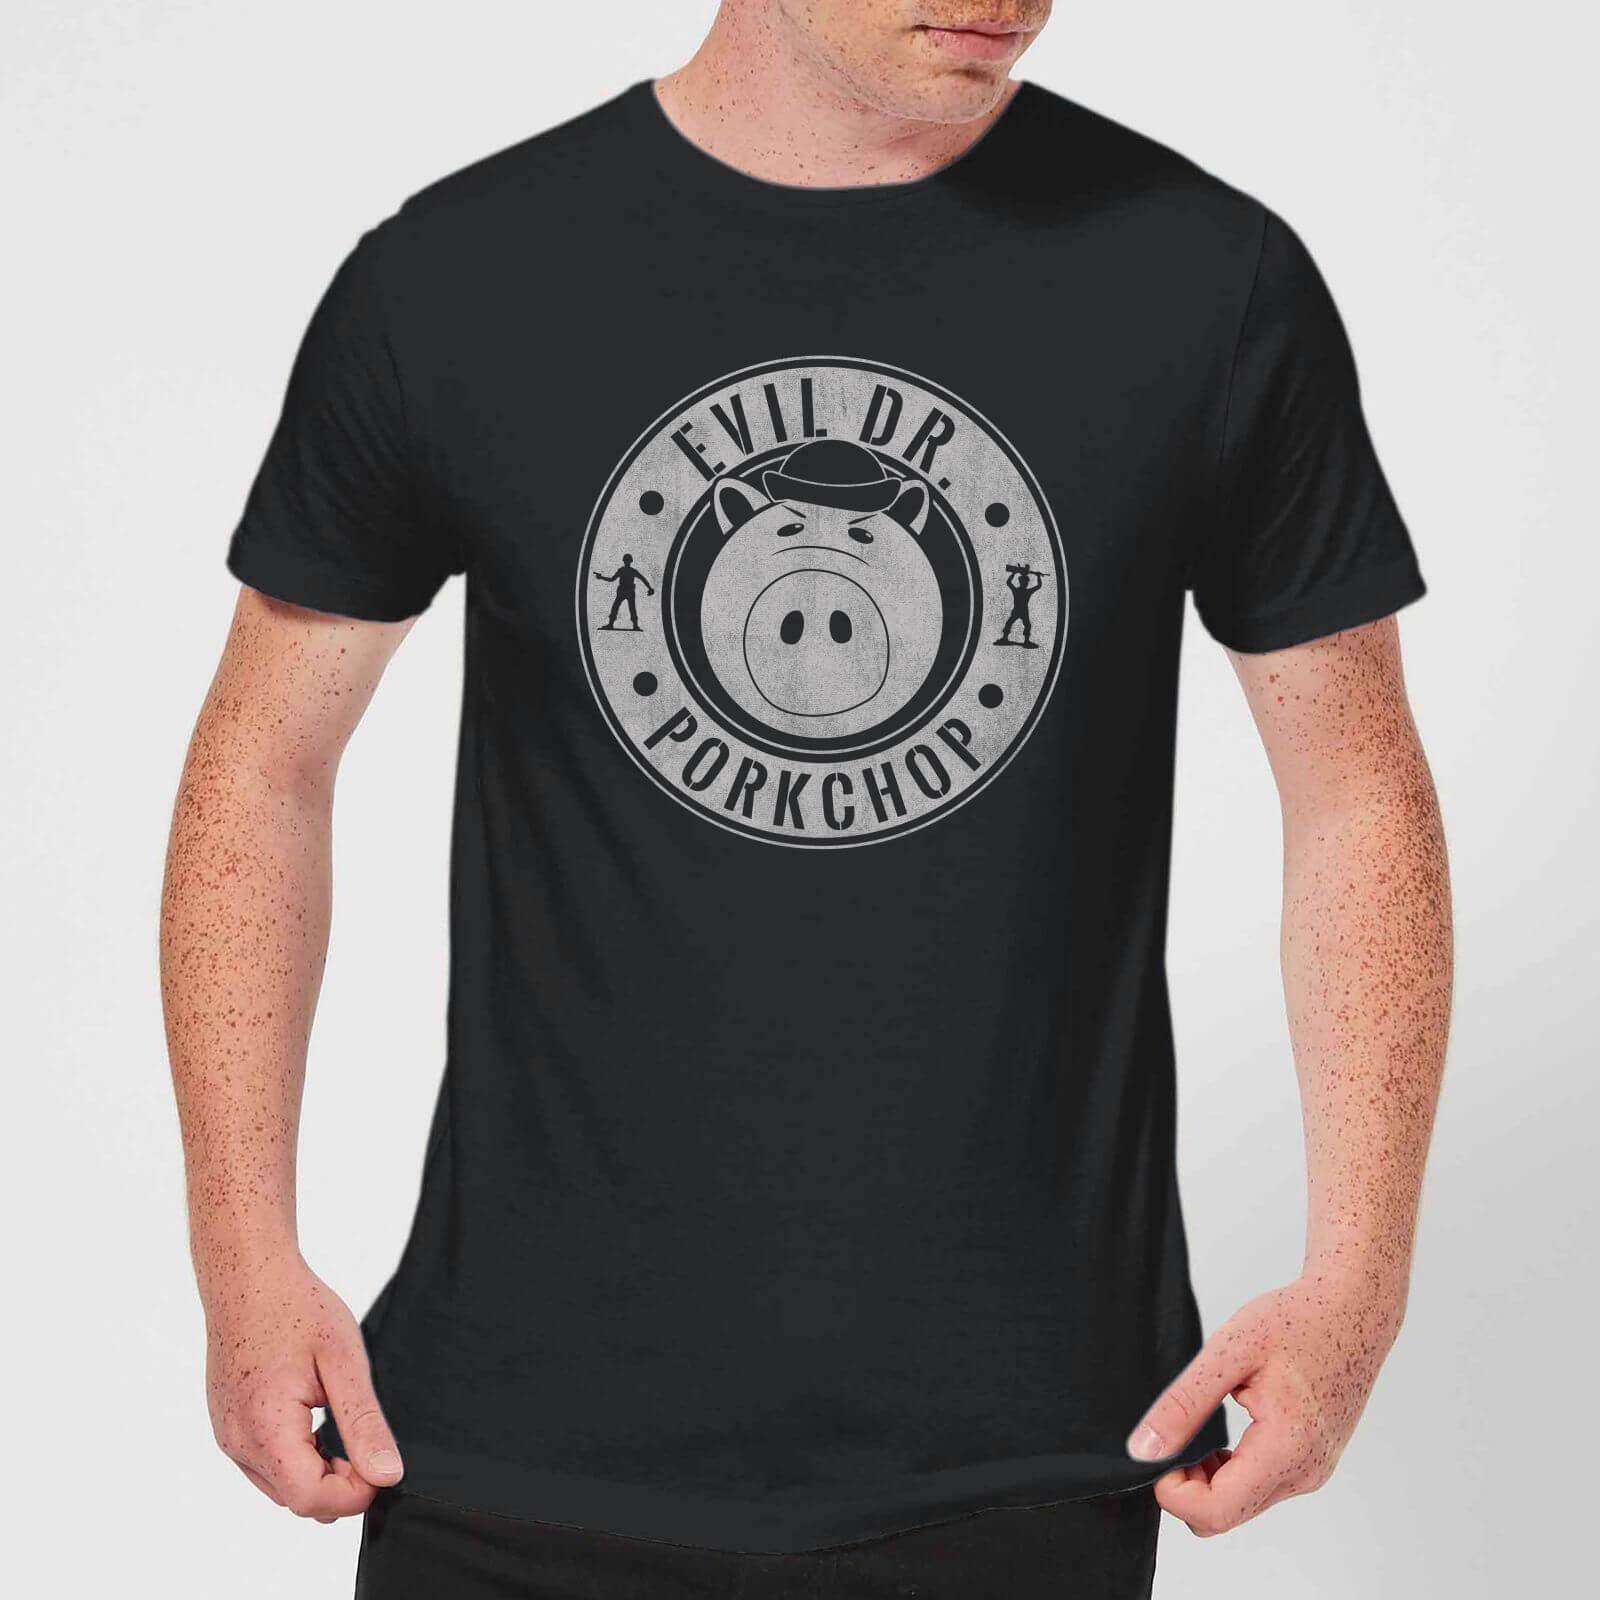 5447f24fc90f00 Toy Story Dr Porkchop Men's T-Shirt - Black Clothing   Zavvi